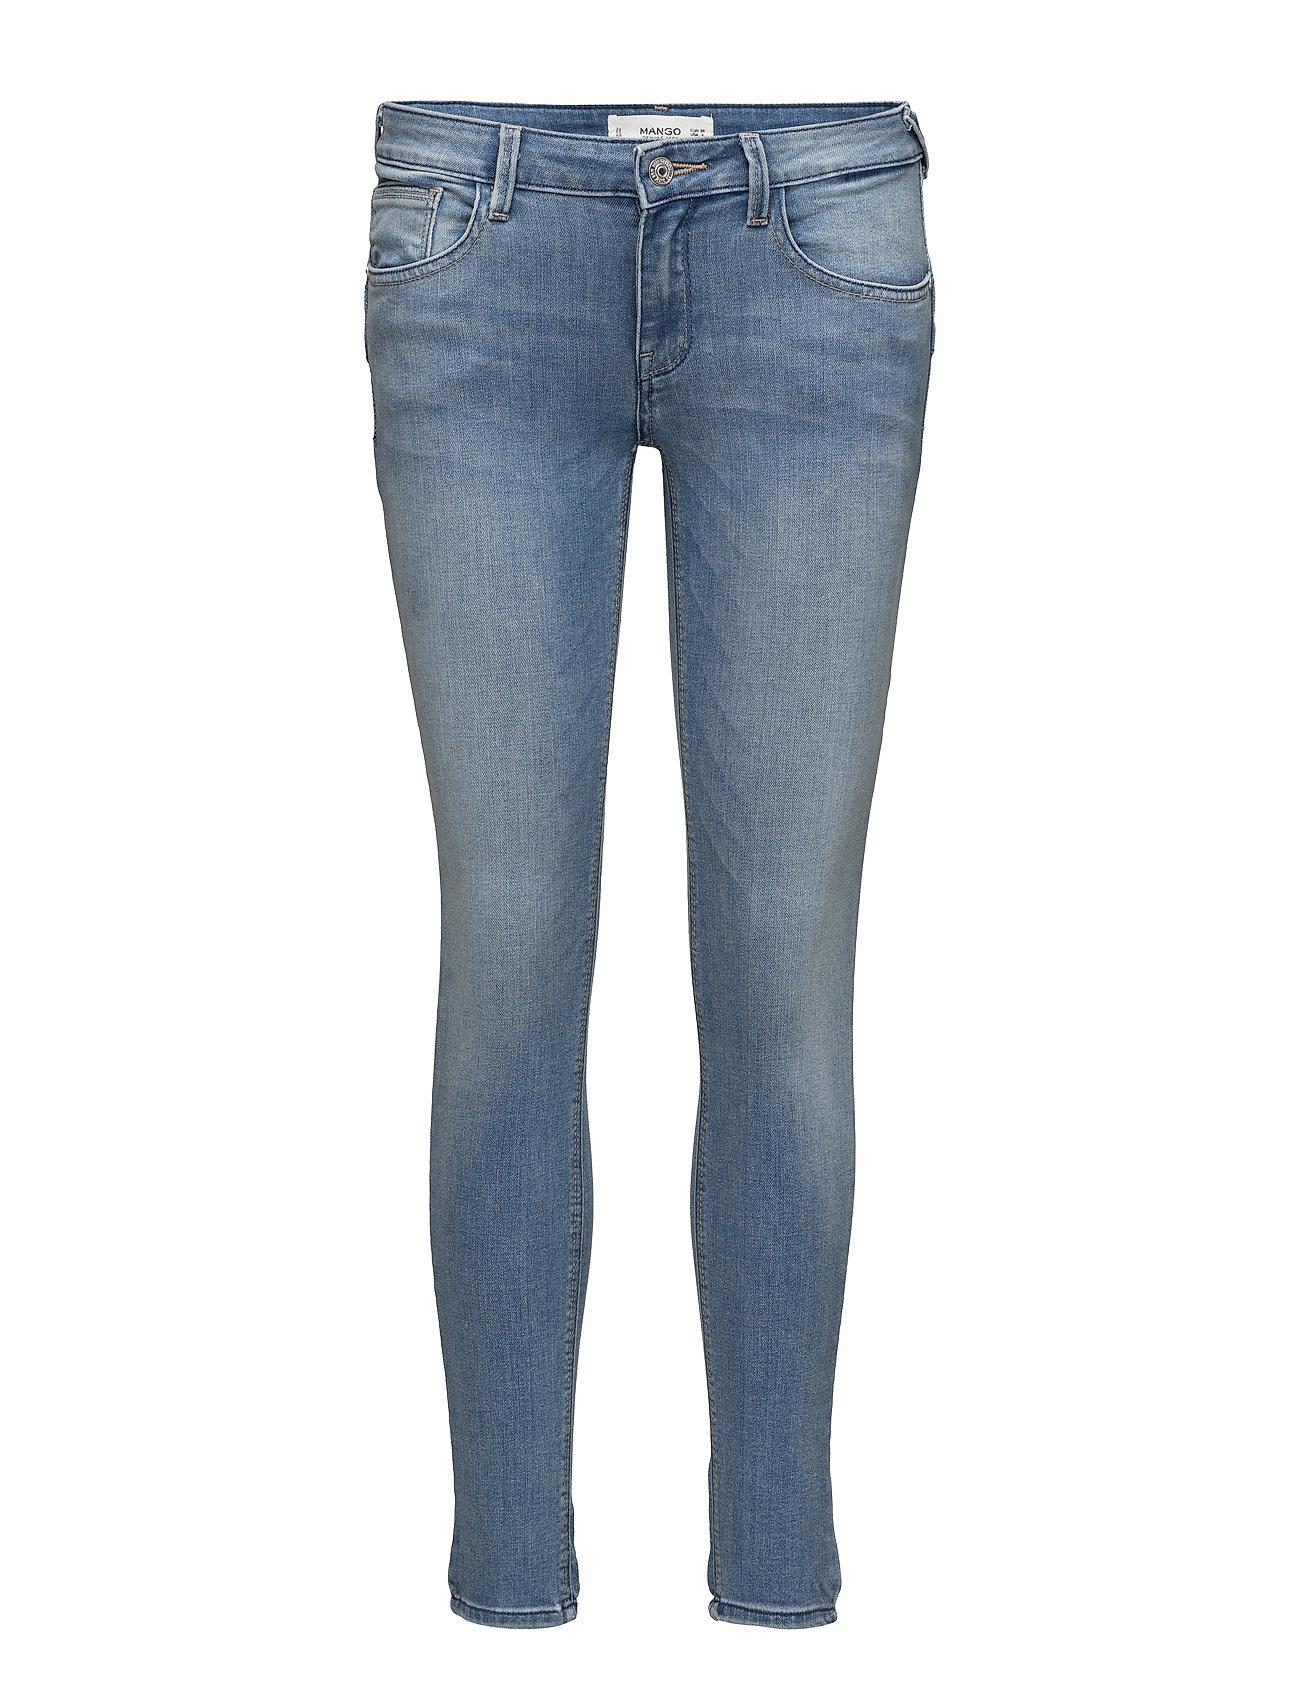 Kim Skinny Push-Up Jeans Mango Jeans til Kvinder i Open Blå